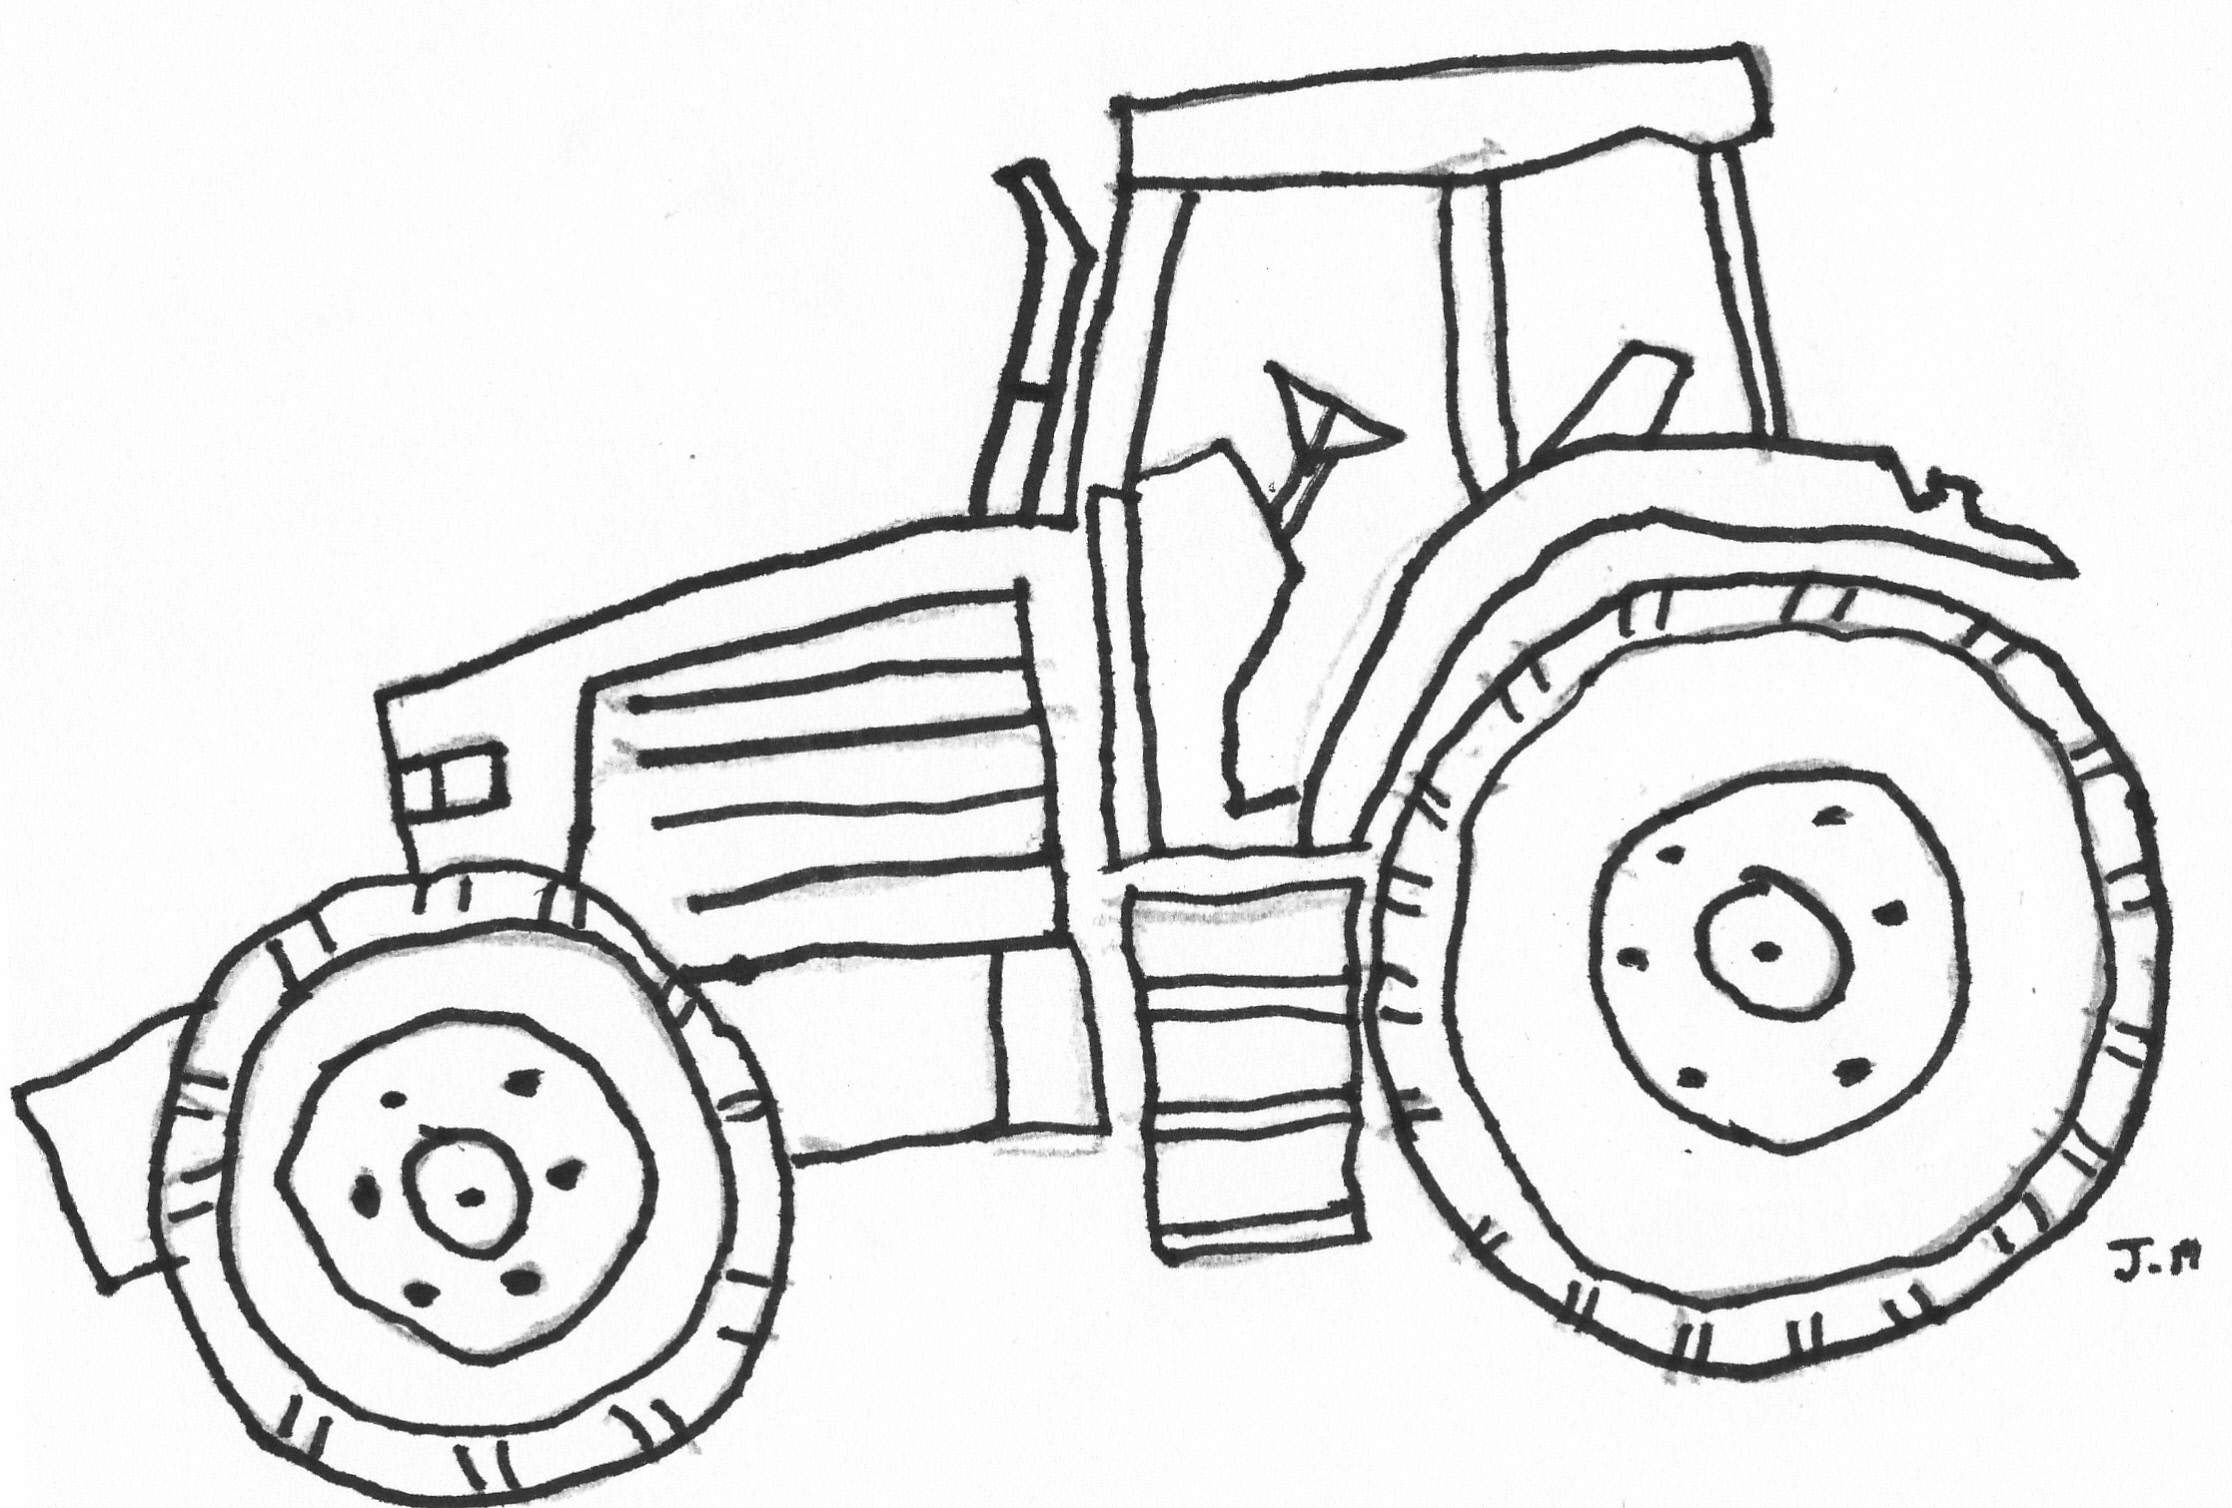 John Deere Tractor Drawing at GetDrawings.com | Free for ...